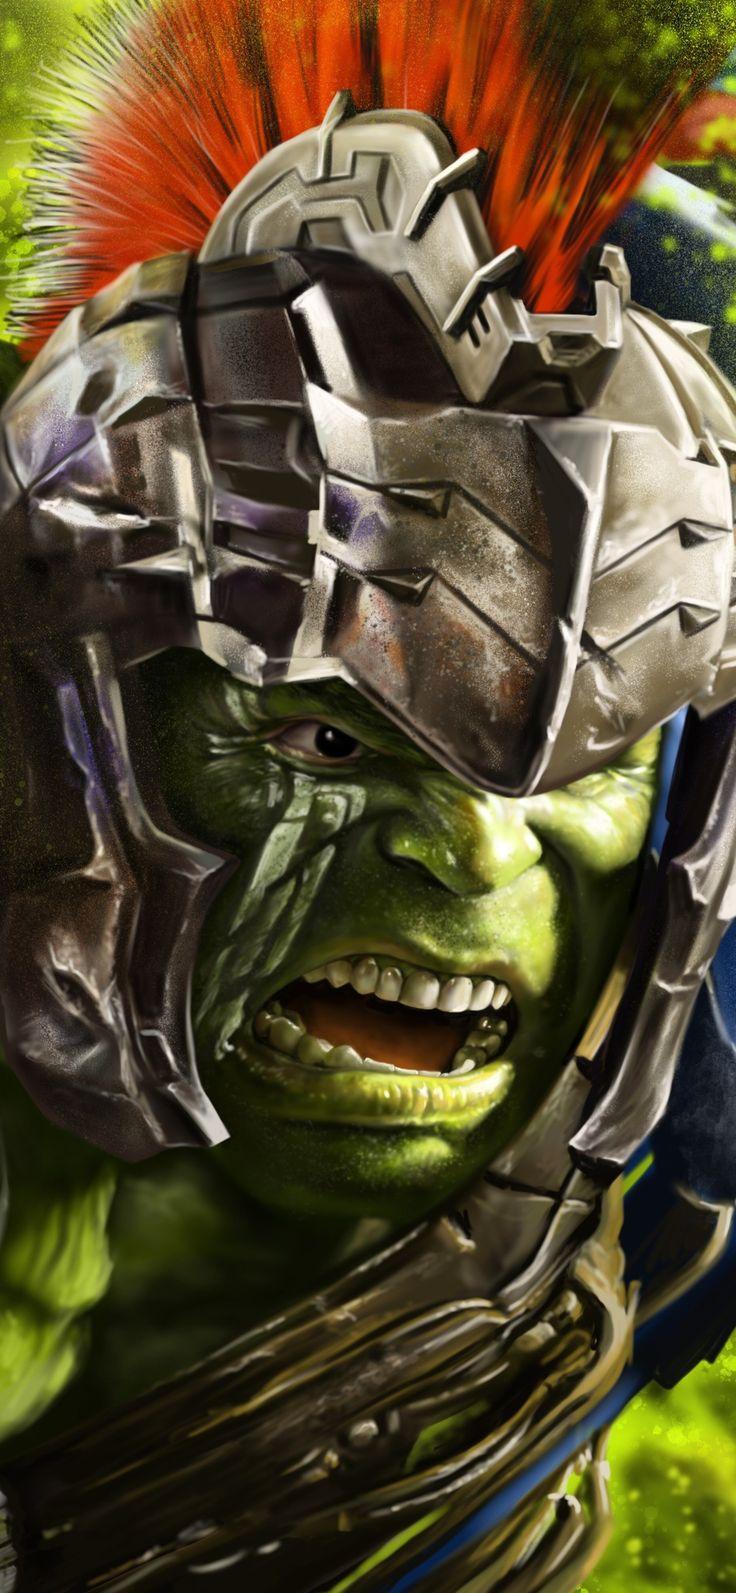 1125x2436 Hulk In Thor Ragnarok 8k Artwork Iphone XS